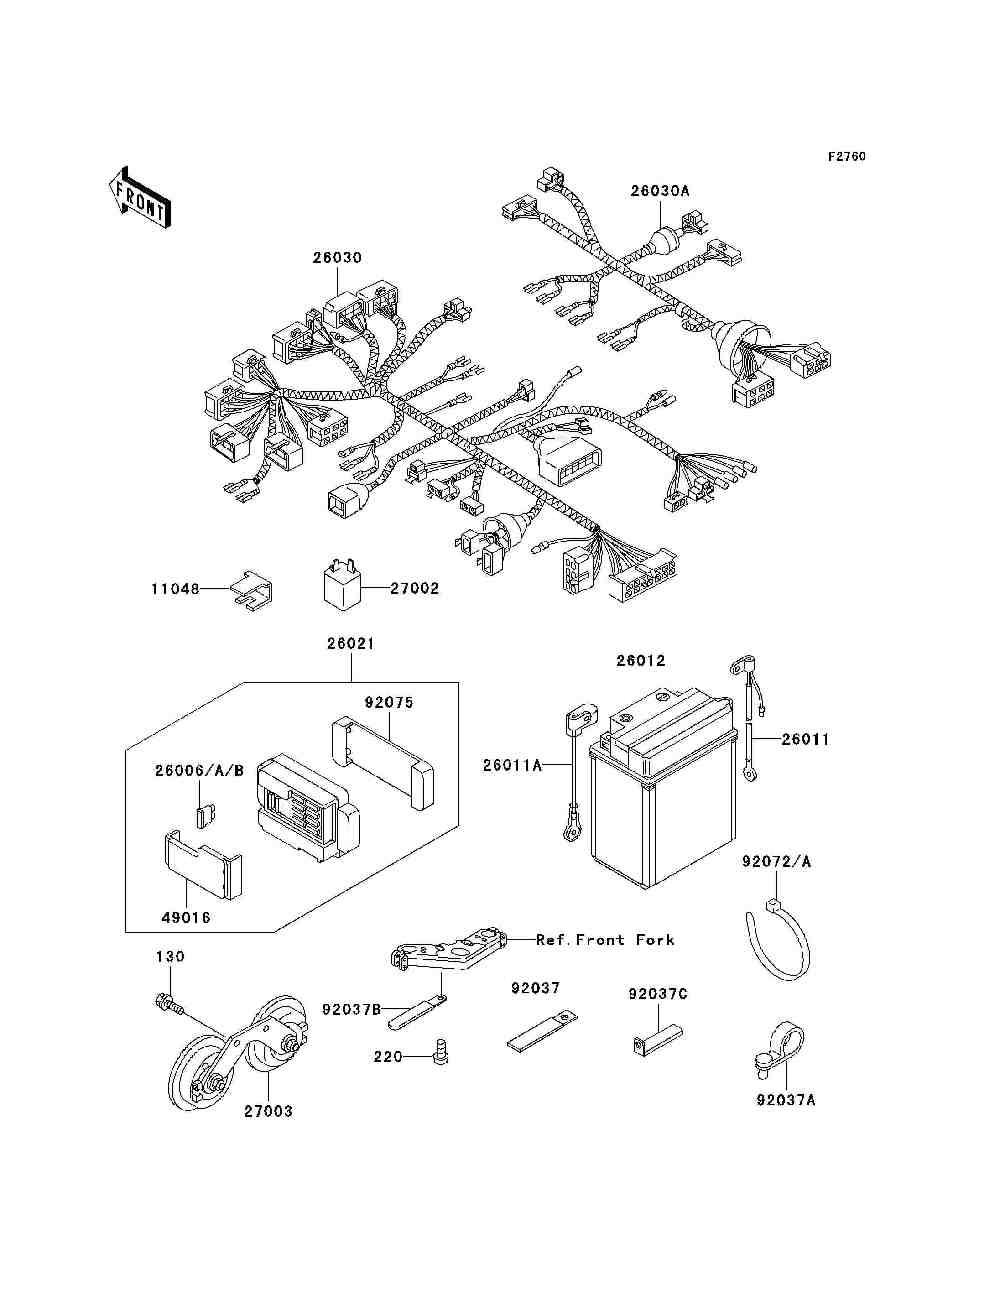 Parts Finder 2006 Kawasaki Motorcycles Vanderzee Motorplex In Zg1000 Wiring Diagram South Haven Mi